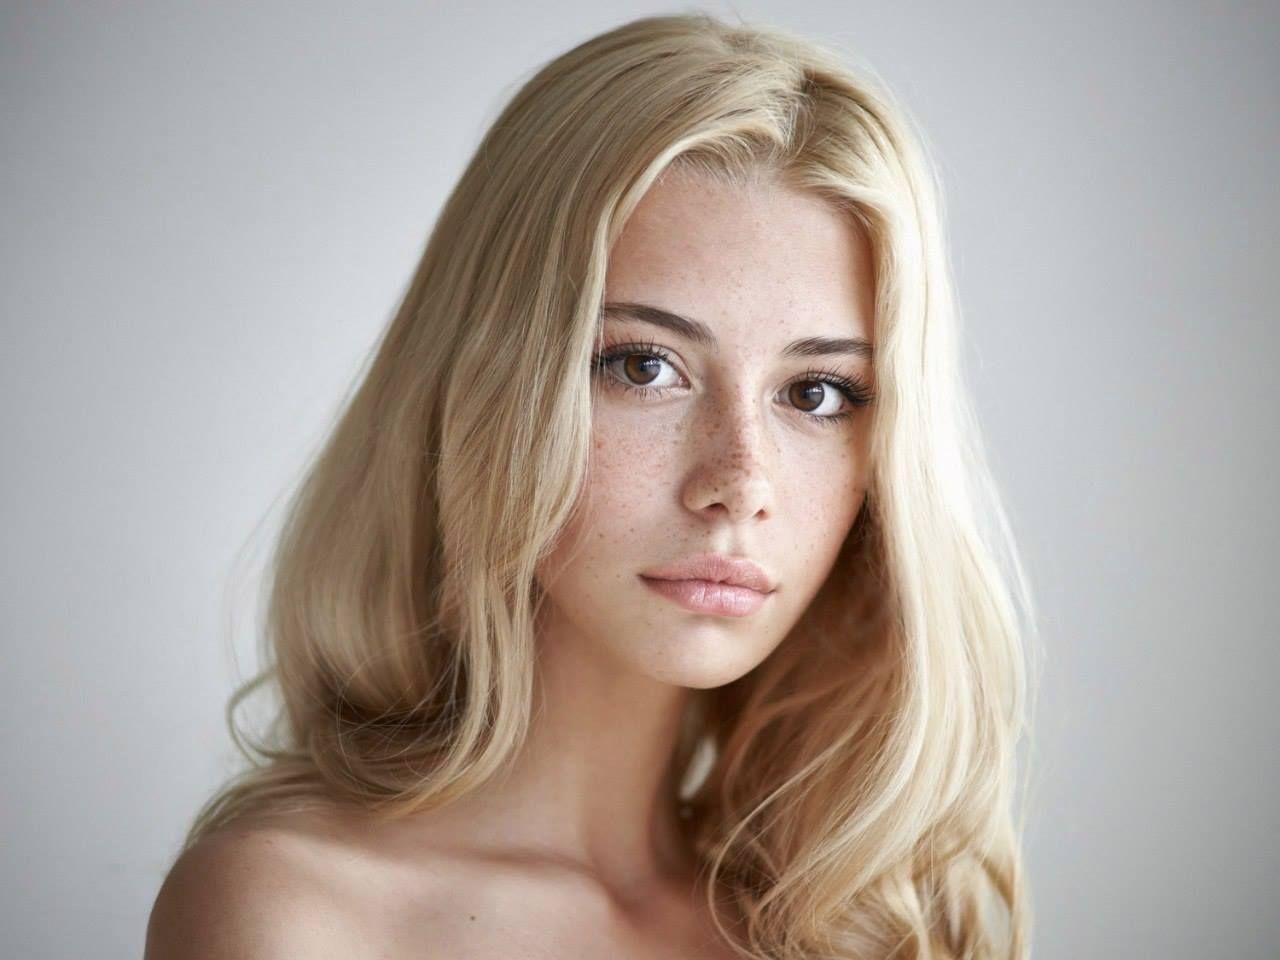 Pingl Sur Portraits Fminins-3709